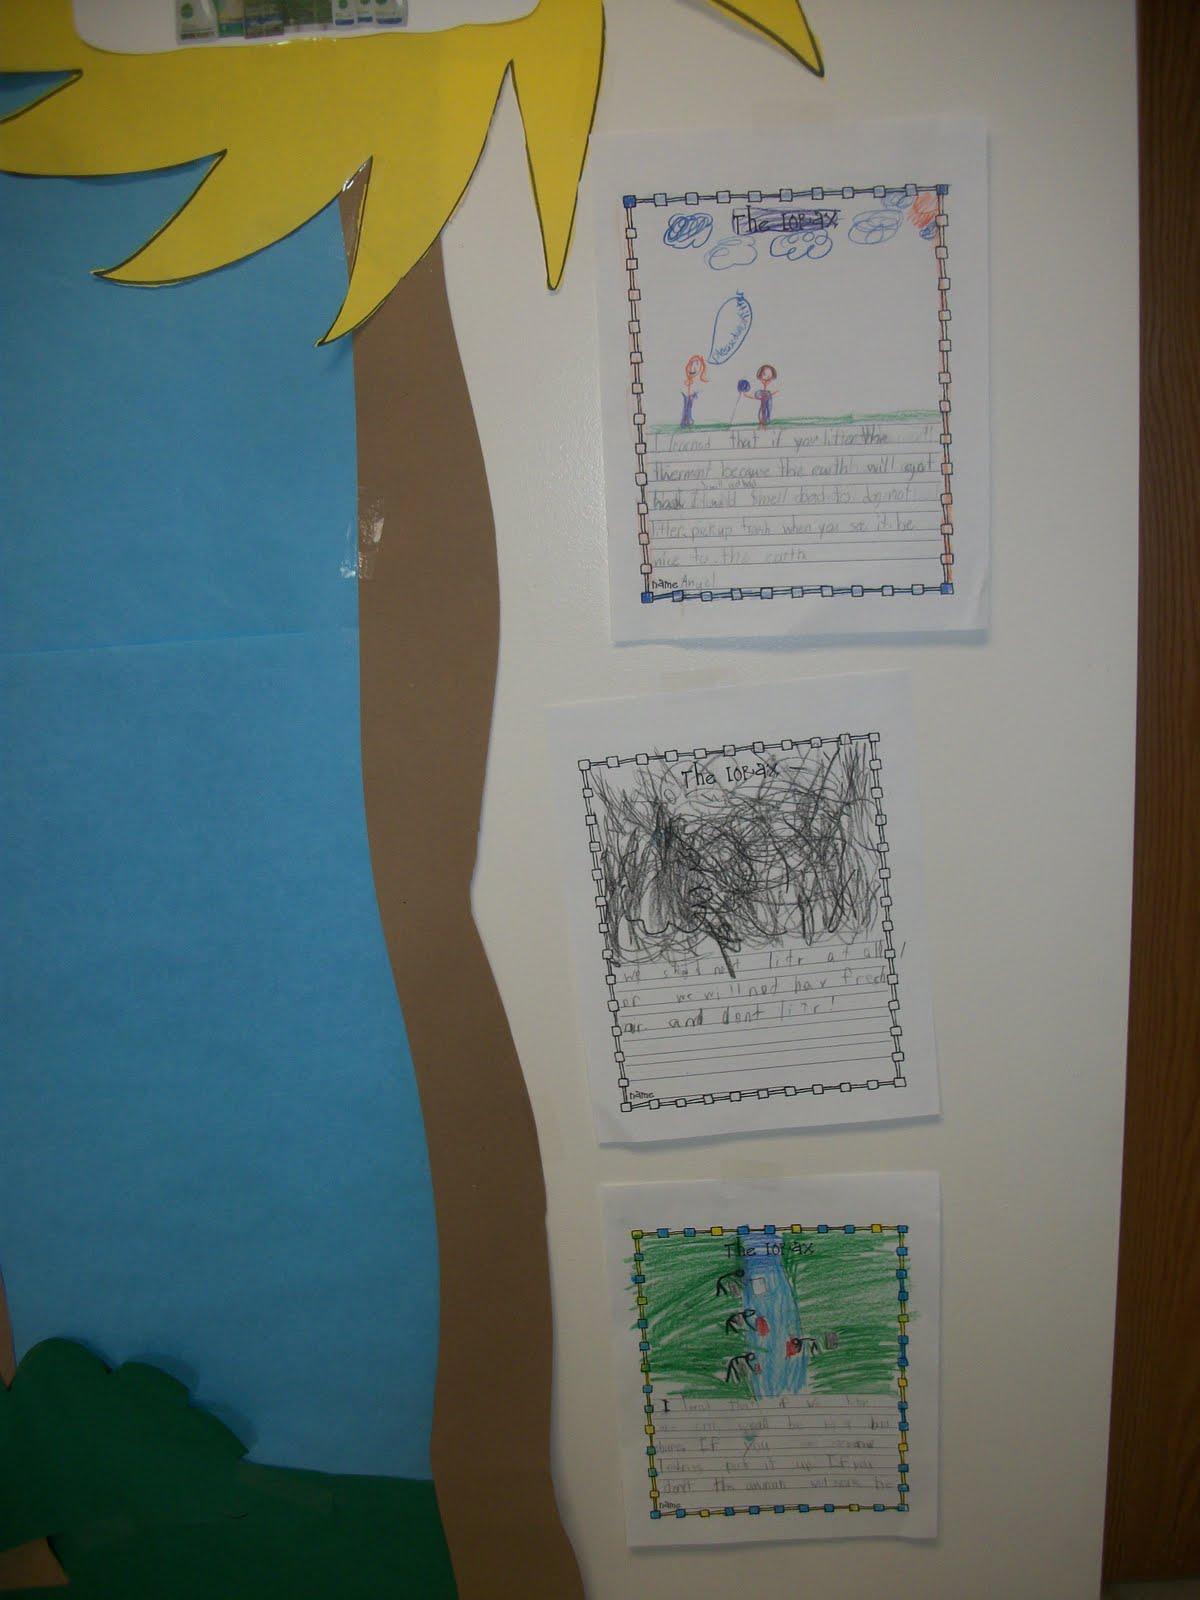 You Can Make The Sun Shine Anytime Earth Day Bulletin Board Idea Featuring The Lorax